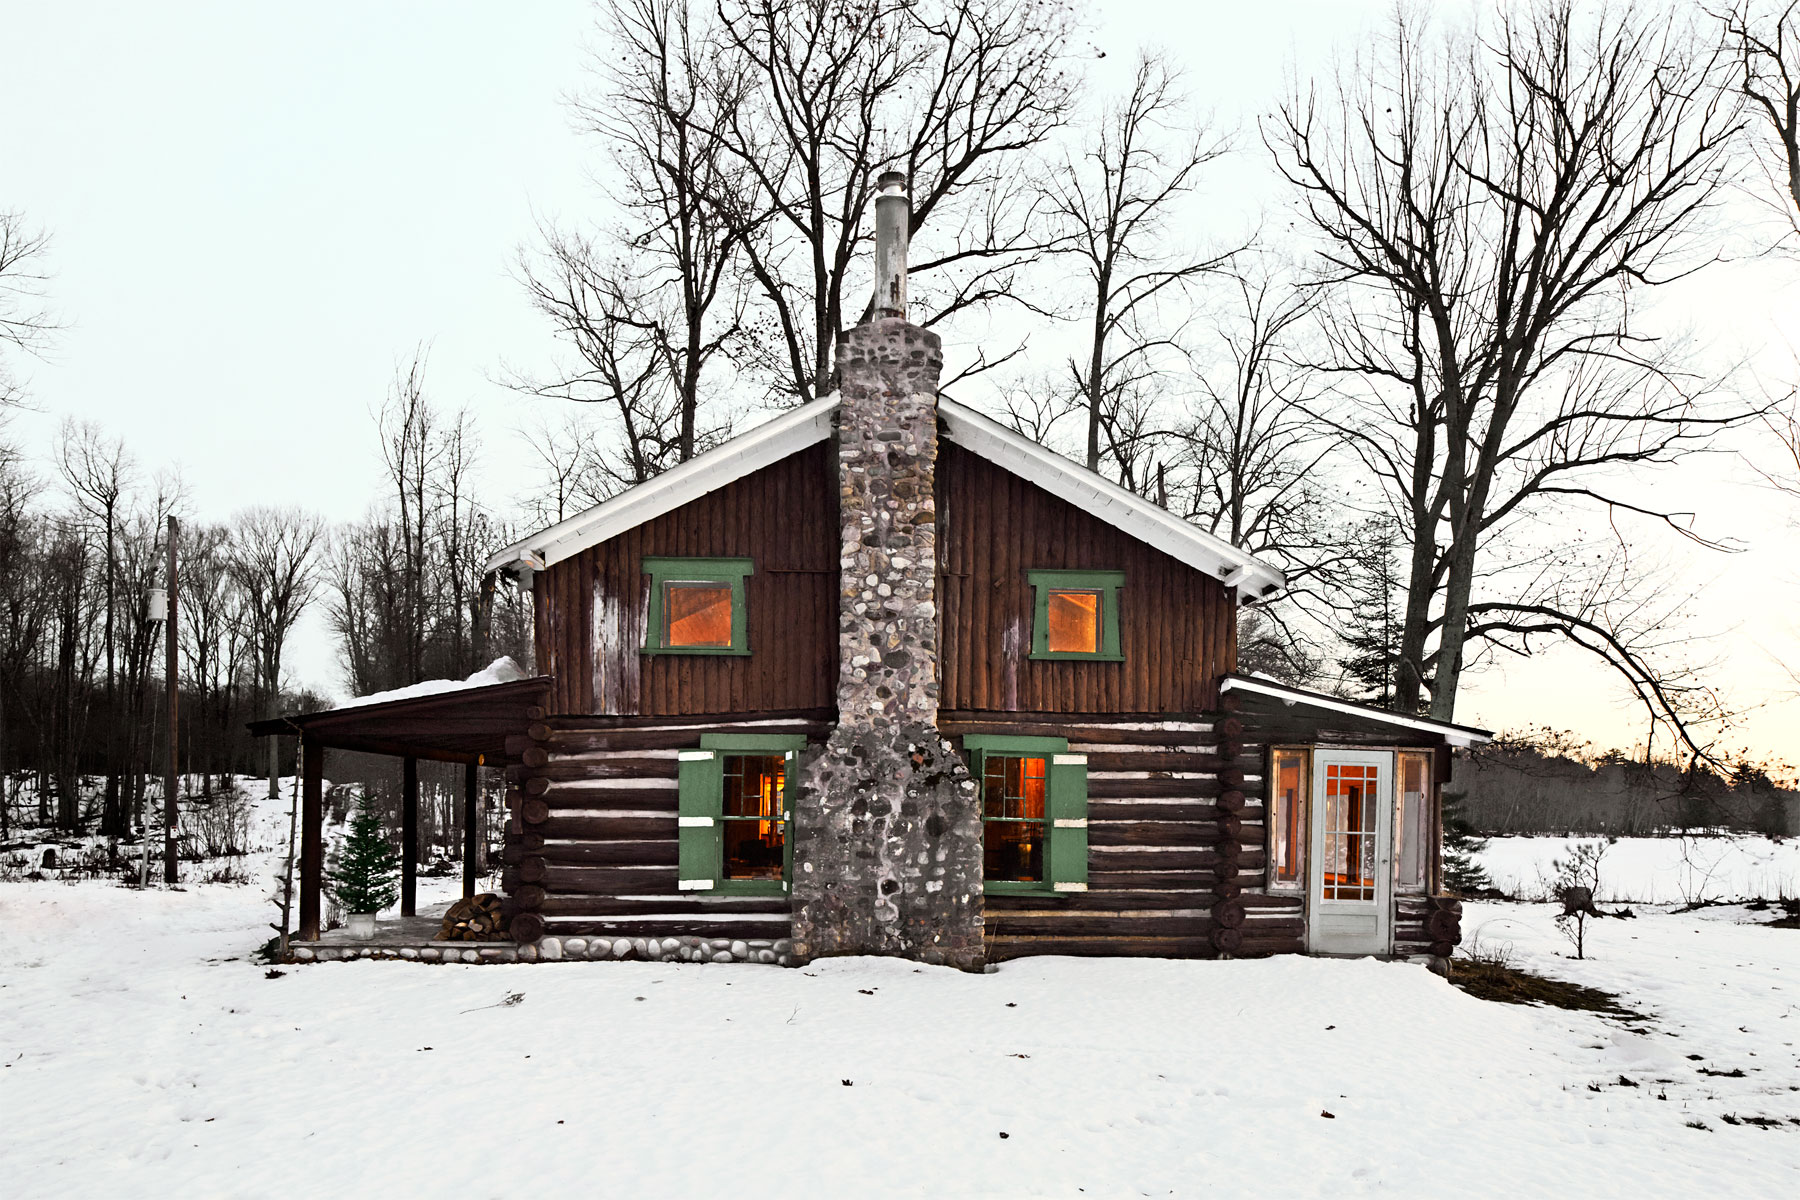 patrick mcguire christmas cabin christmas cabin. Black Bedroom Furniture Sets. Home Design Ideas